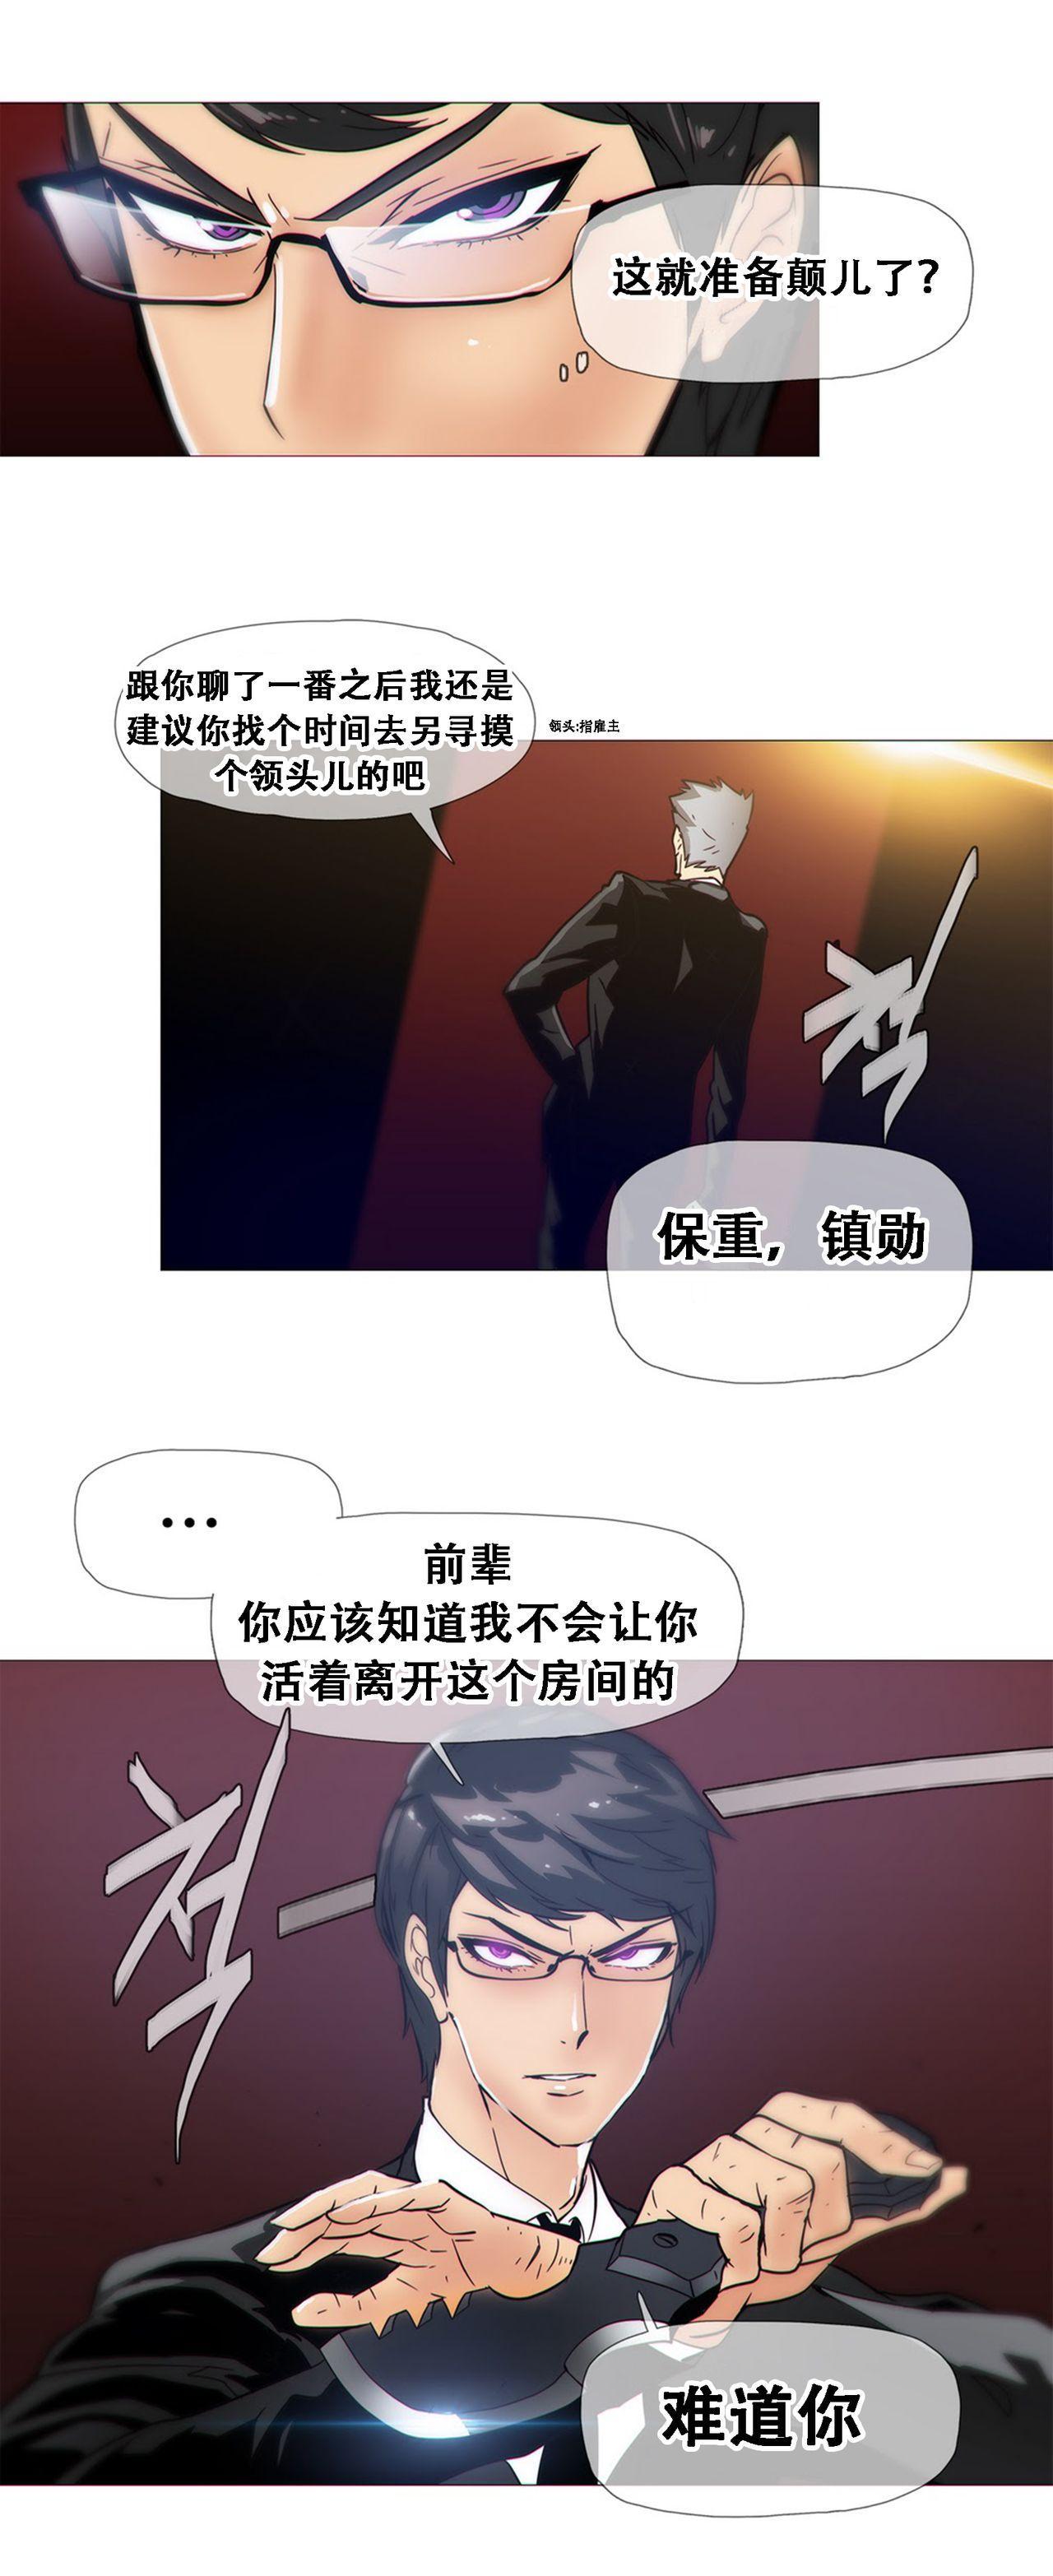 HouseHold Affairs 【卞赤鲤个人汉化】1~33话(持续更新中) 358